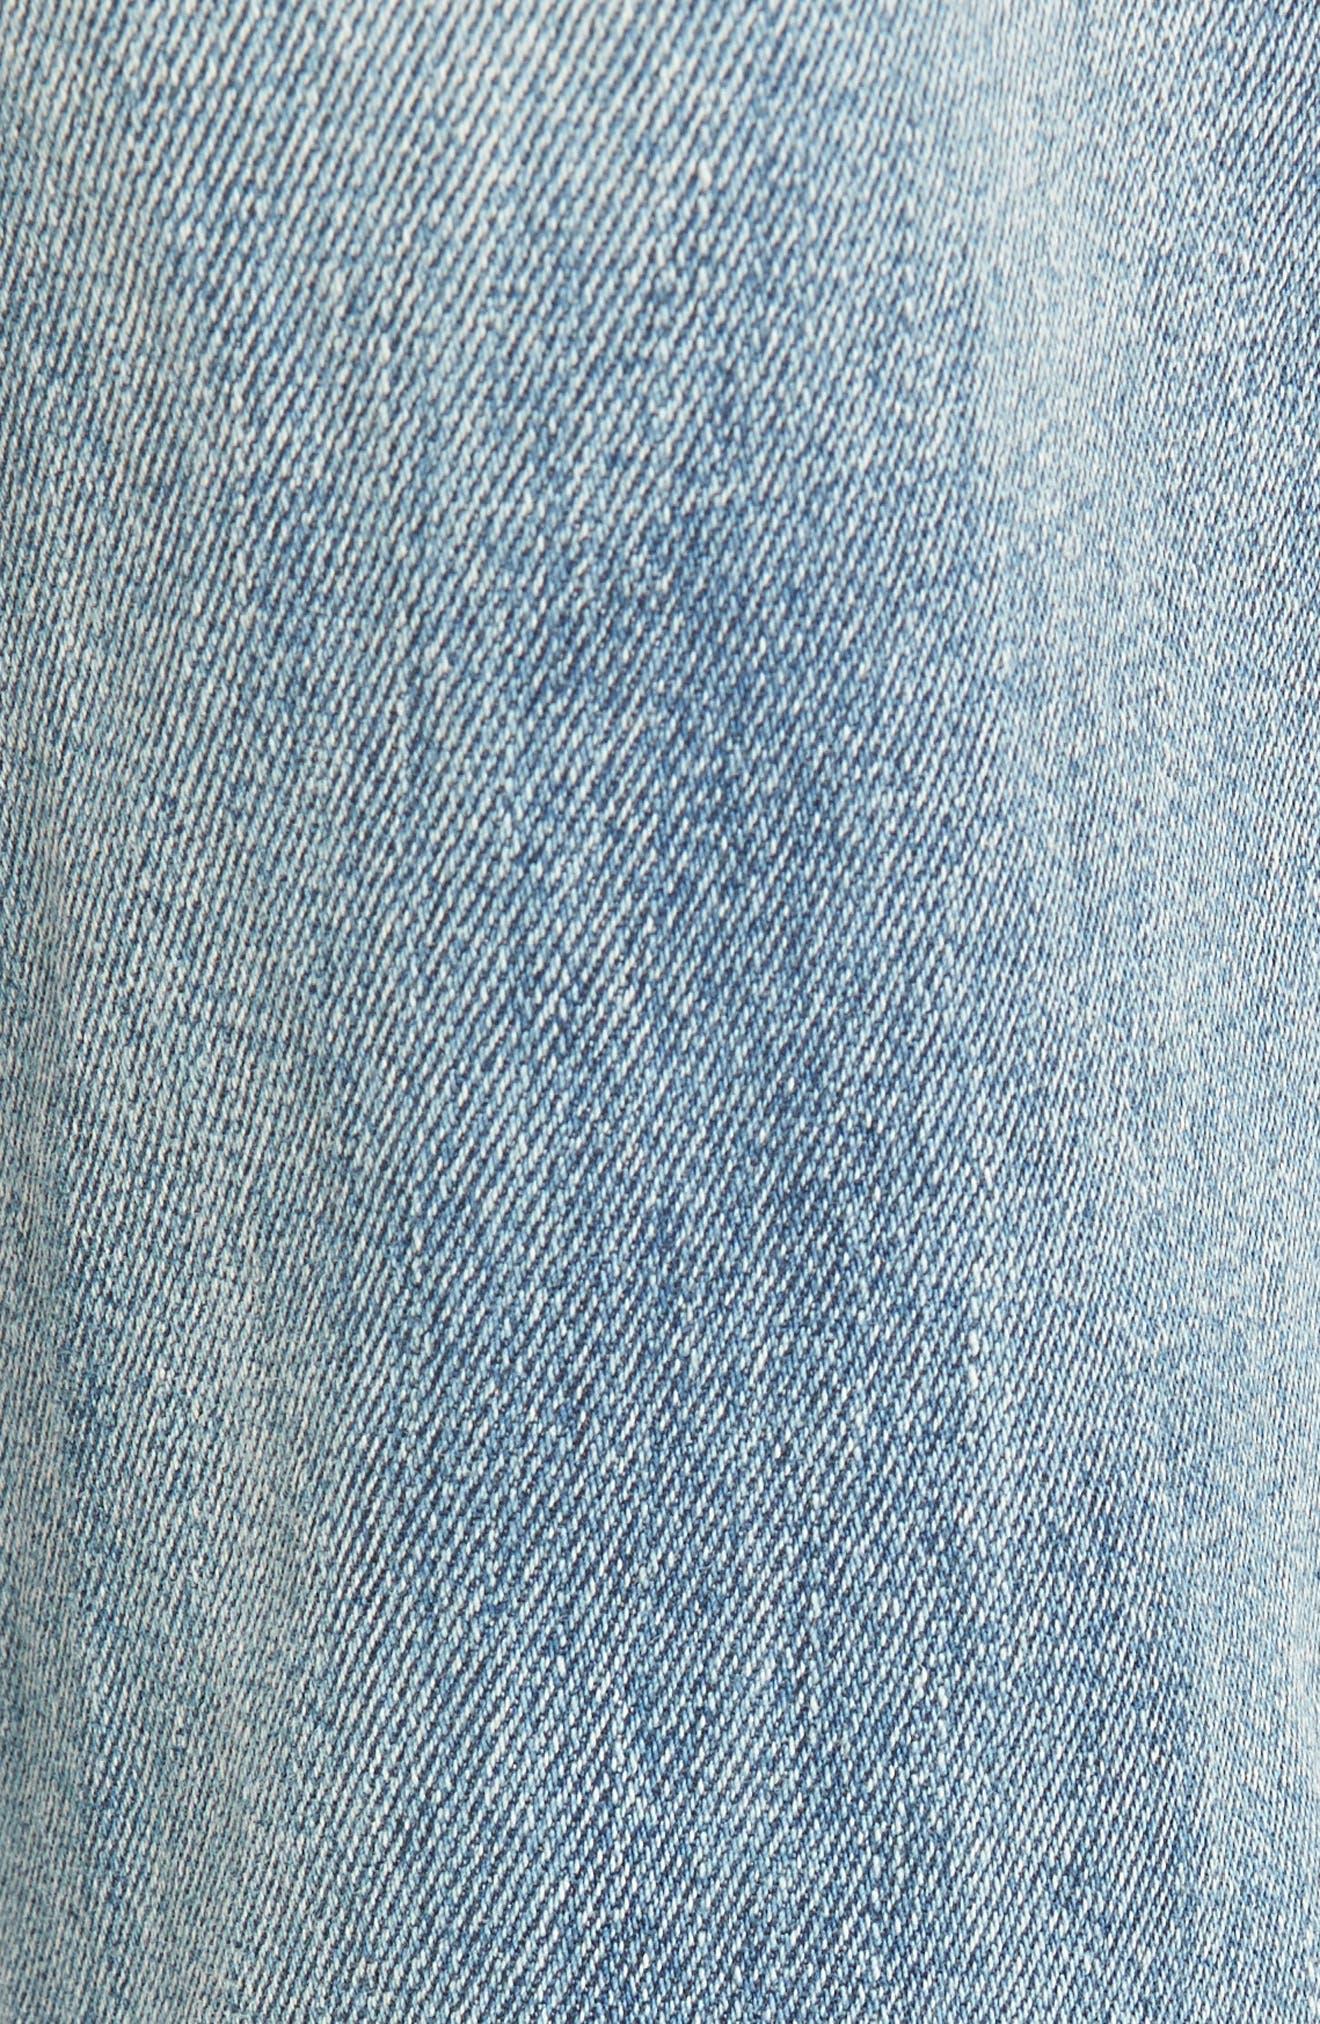 Alternate Image 5  - AFRM Cyrus High Waist Ankle Jeans (Sinner Wash)